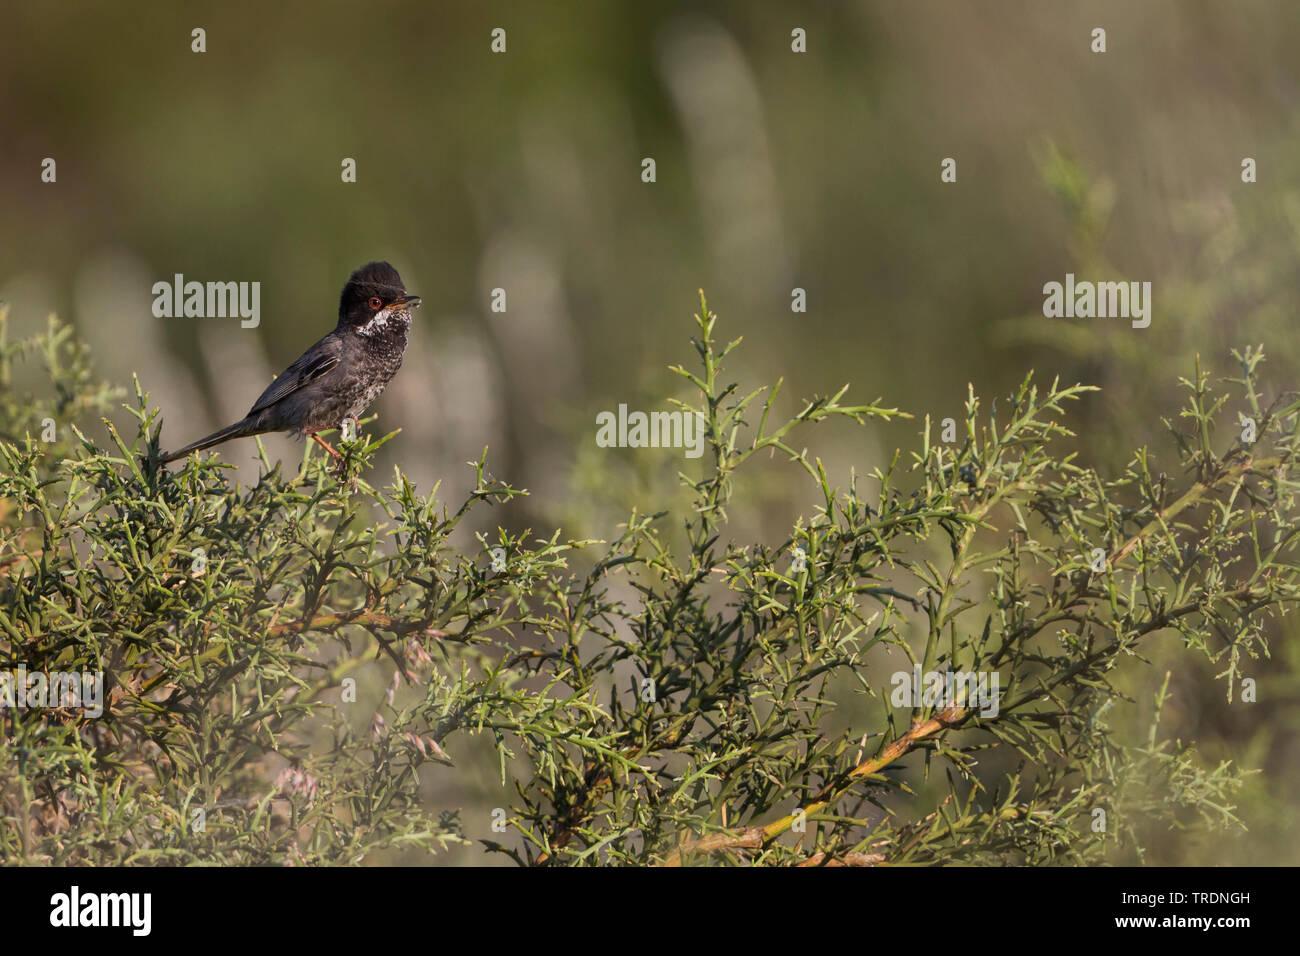 cyprus warbler (Sylvia melanothorax), male on a bush, Cyprus Stock Photo